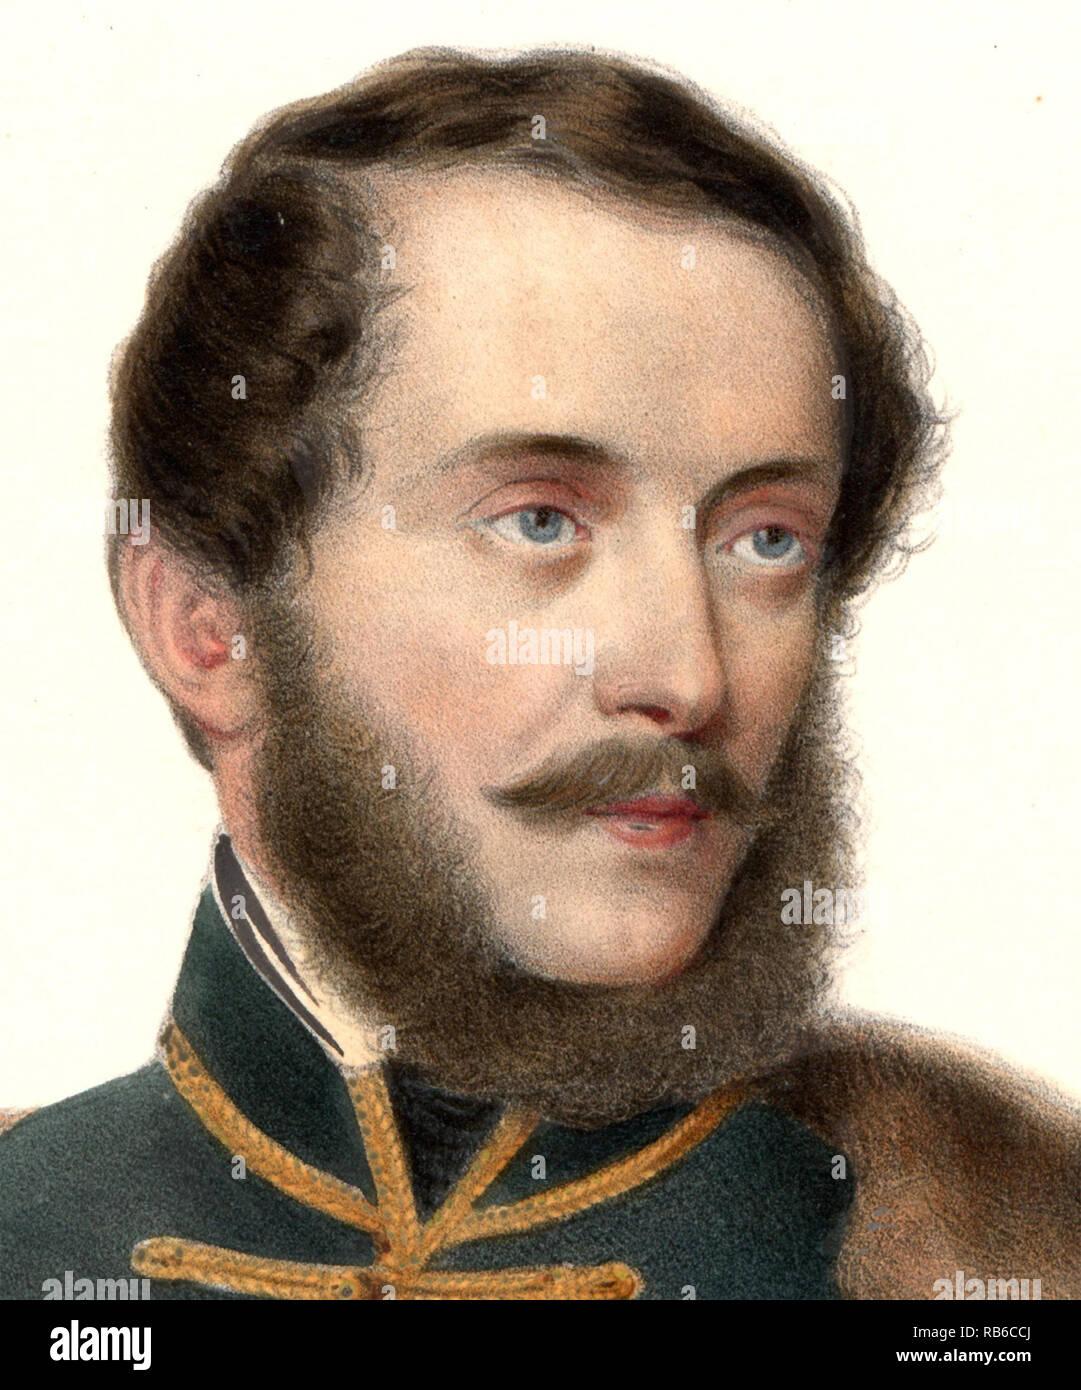 Lajos Kossuth de Udvard et Kossuthfalva (1802 – 1894) Hungarian nobleman, statesman and Governor-President of the Kingdom of Hungary during the revolution of 1848–49. - Stock Image